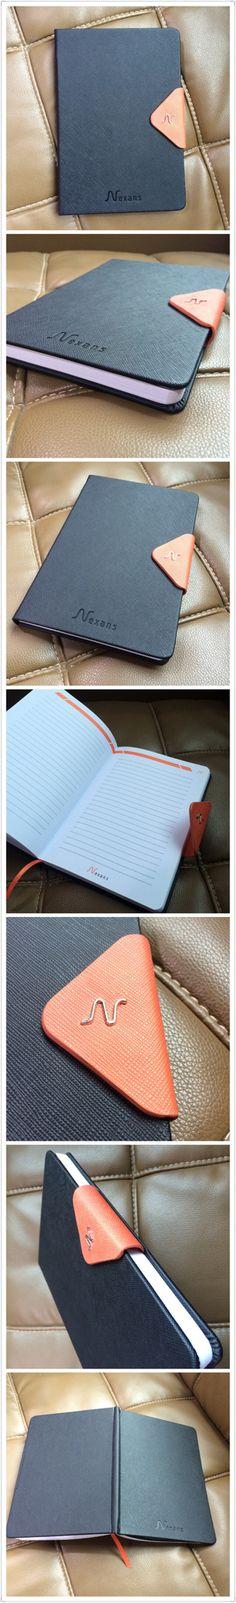 #notebooks #stationery #diary #leuchtturm1917 #DIY   #adobe #moleskine #planner #journals #passionplanner  #notebook #drawing